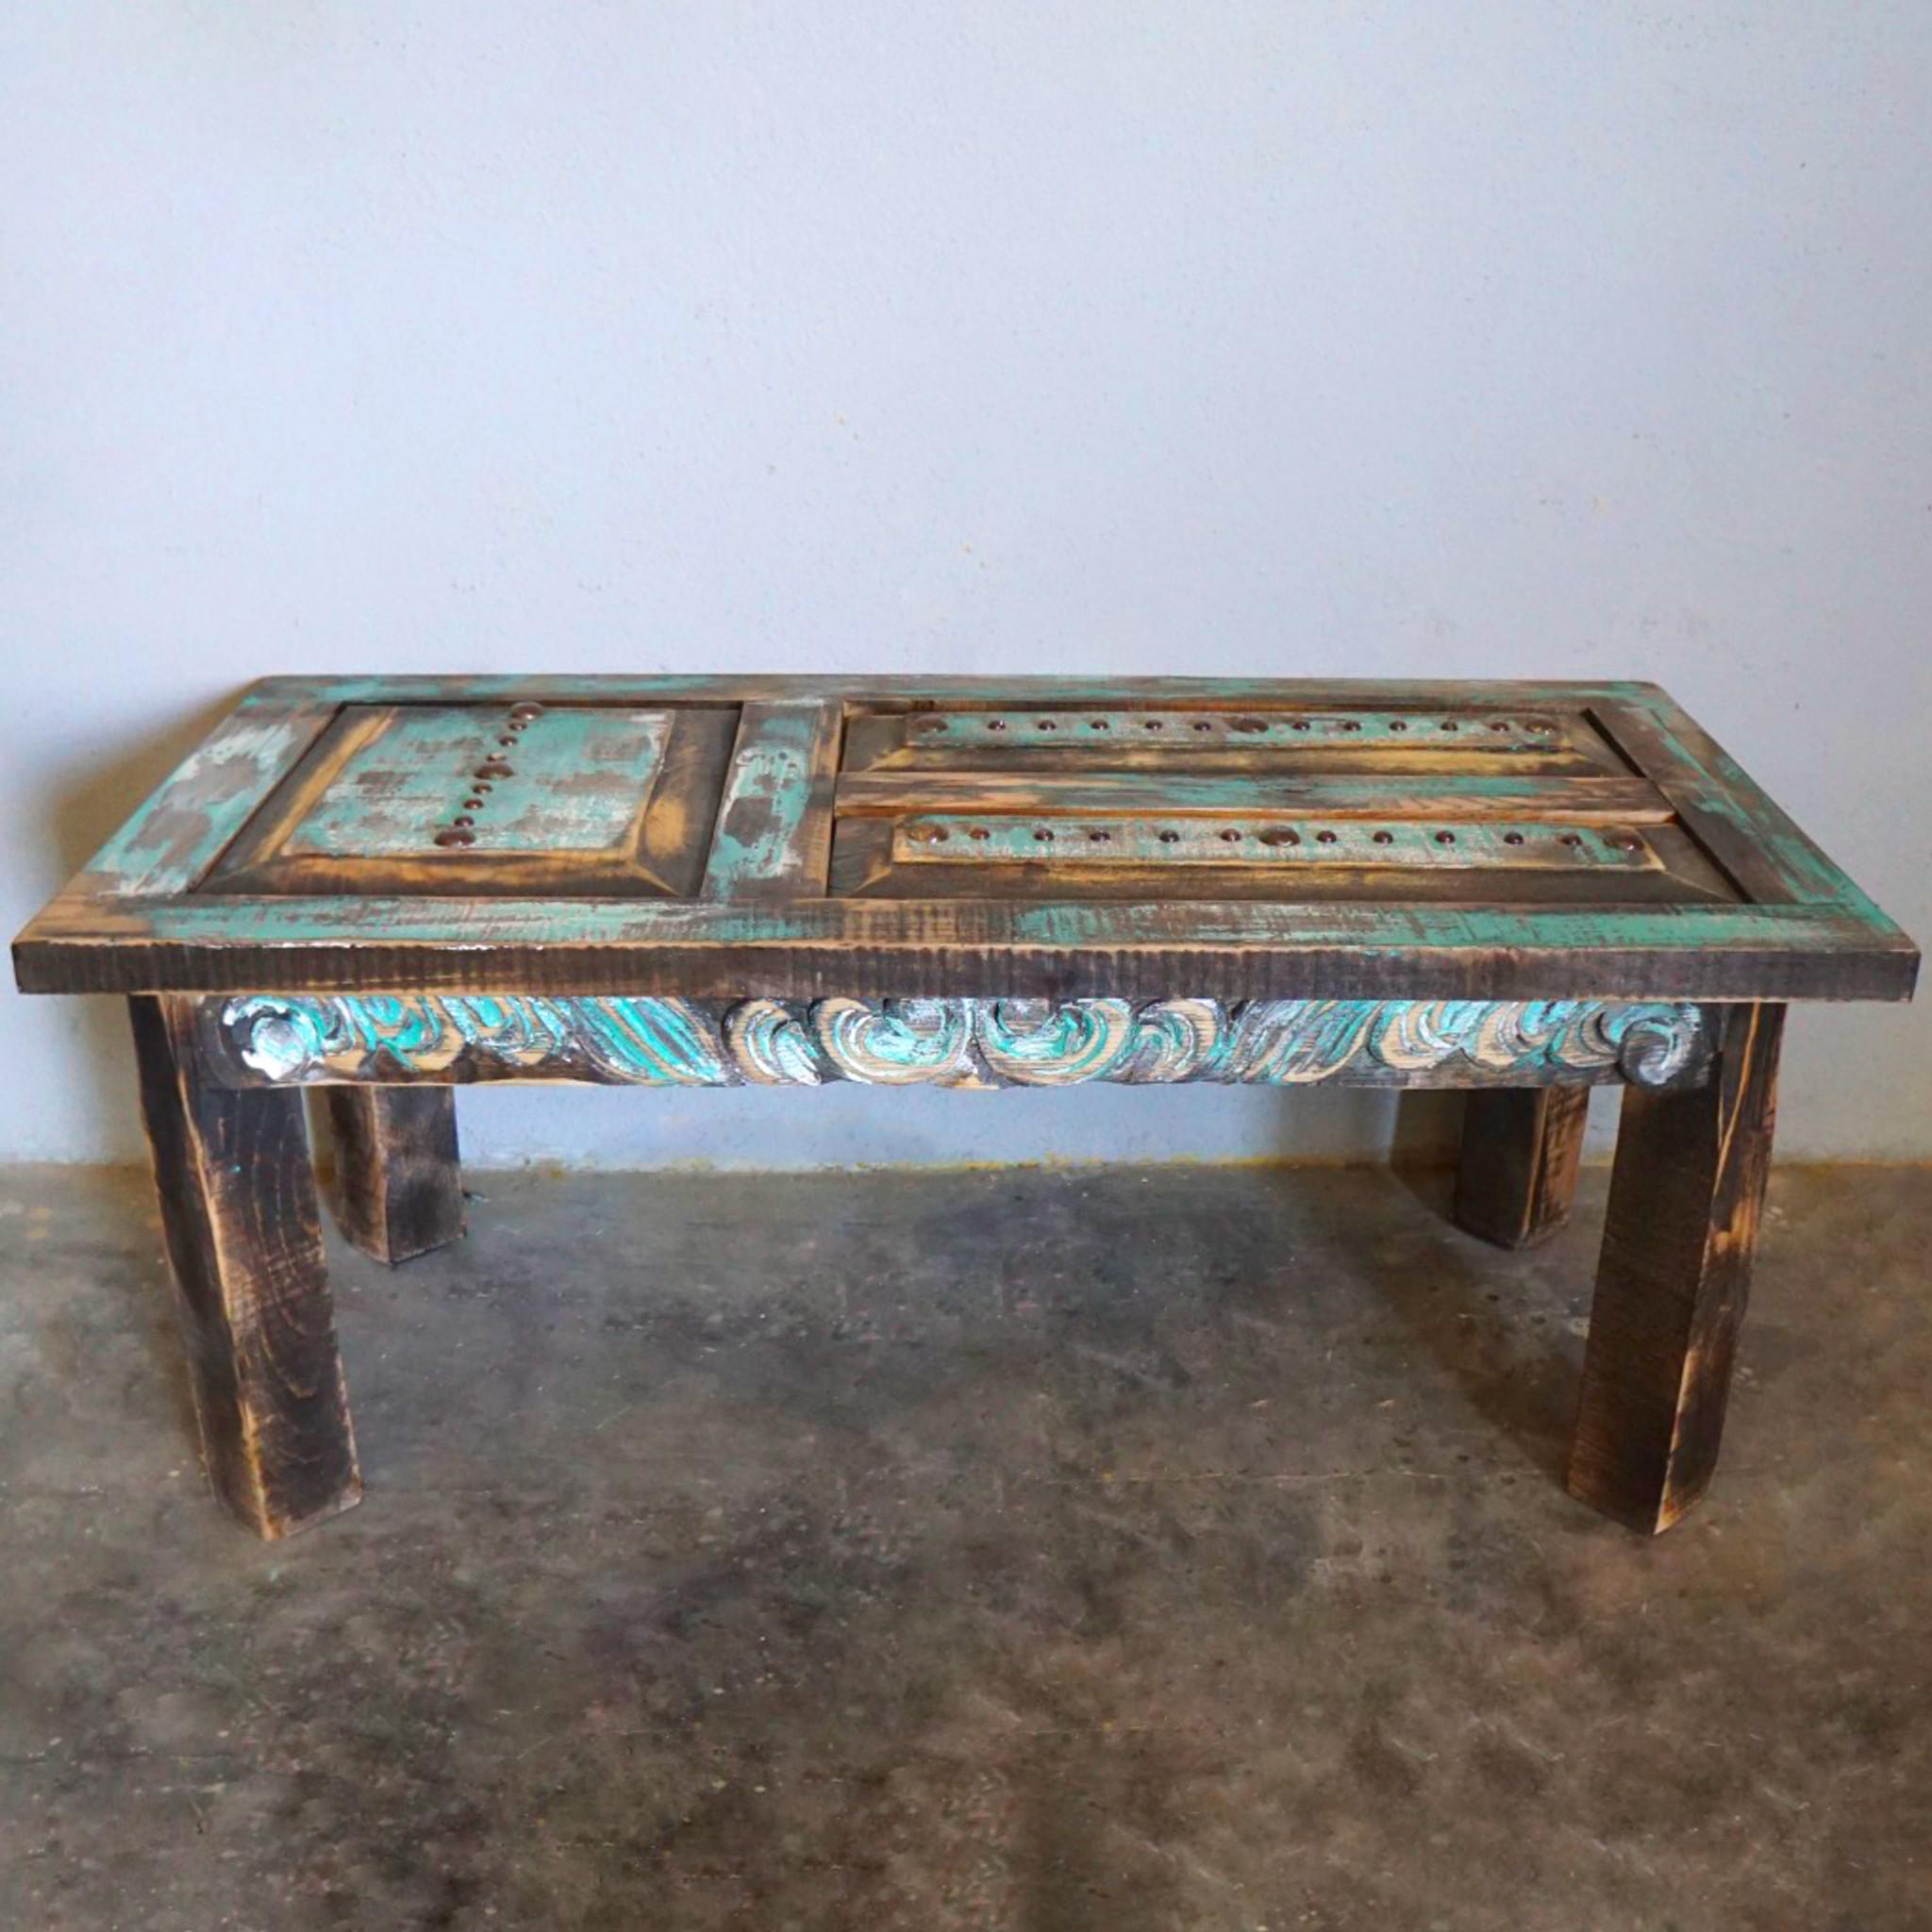 - Old Door Coffee TableSofia's Rustic Furniture